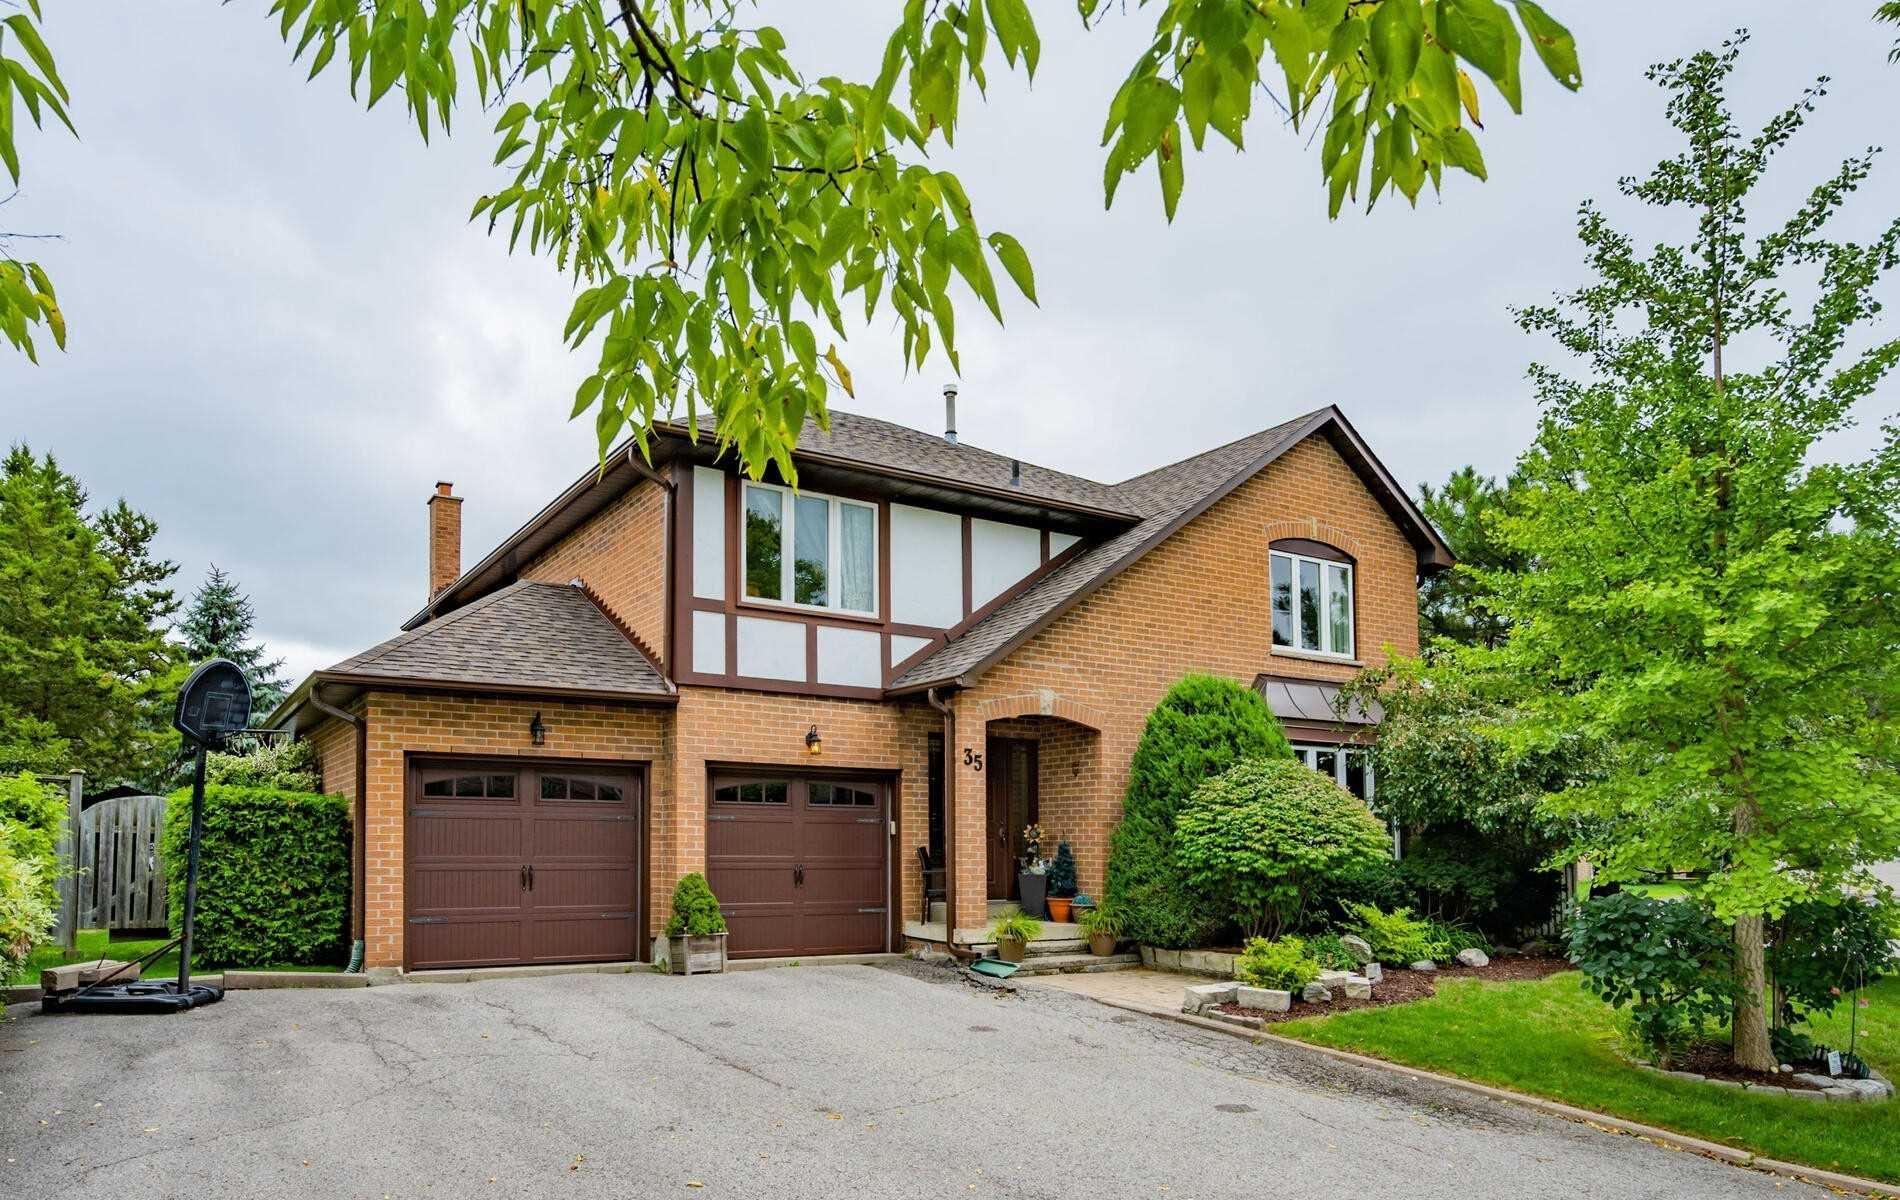 Main Photo: 35 Ashfield Drive in Richmond Hill: Oak Ridges Lake Wilcox House (2-Storey) for sale : MLS®# N4908106